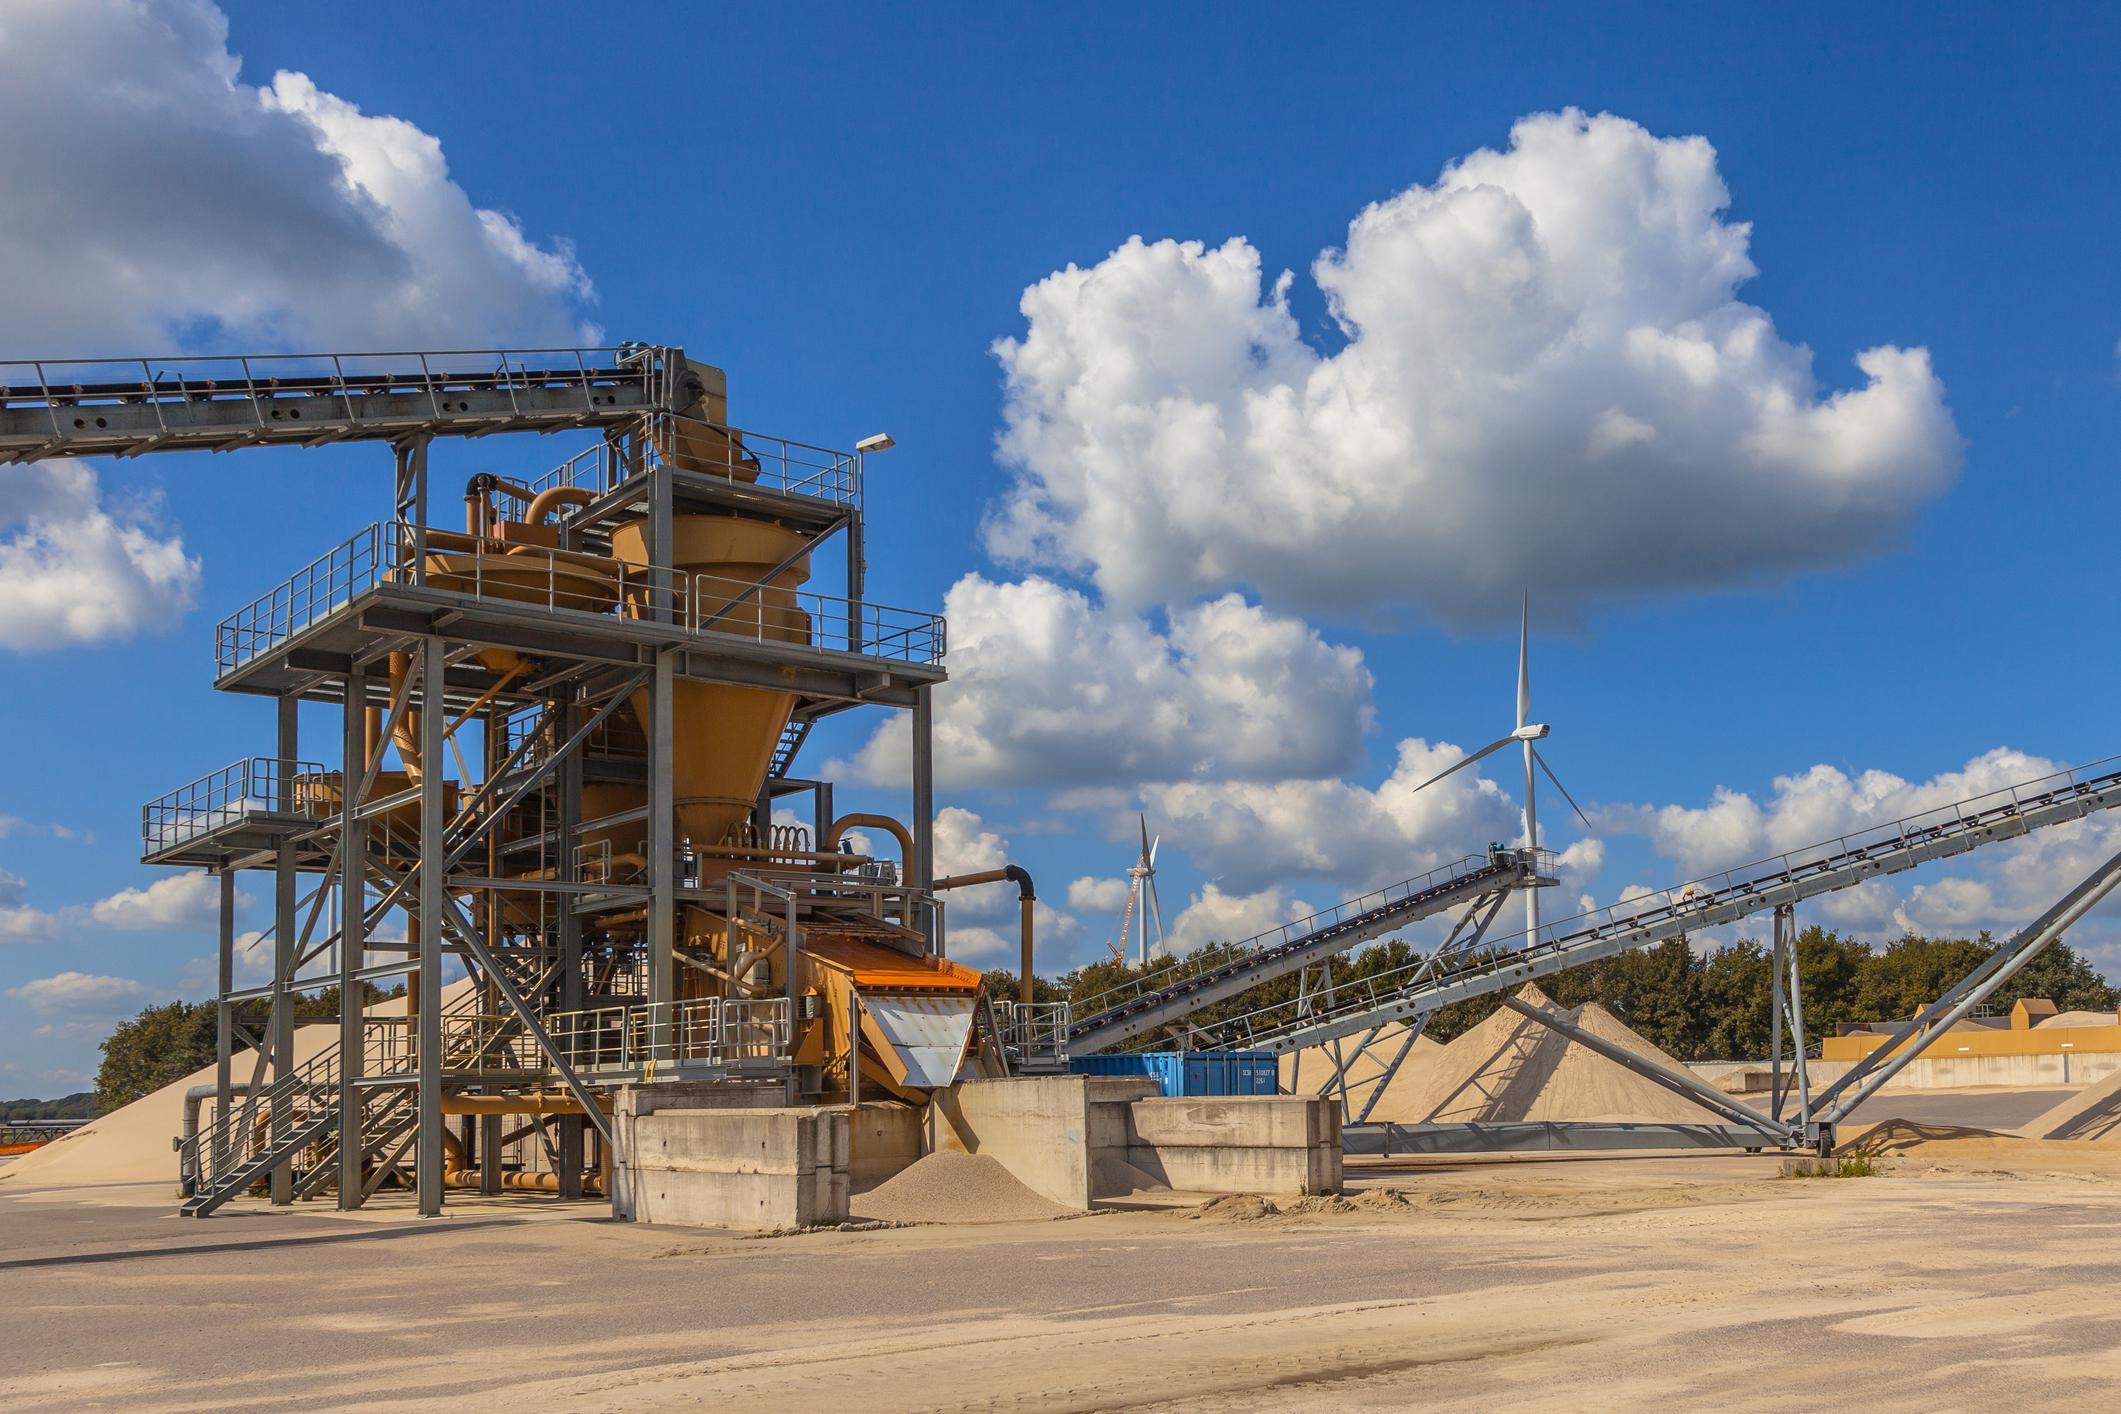 Sand mine equipment